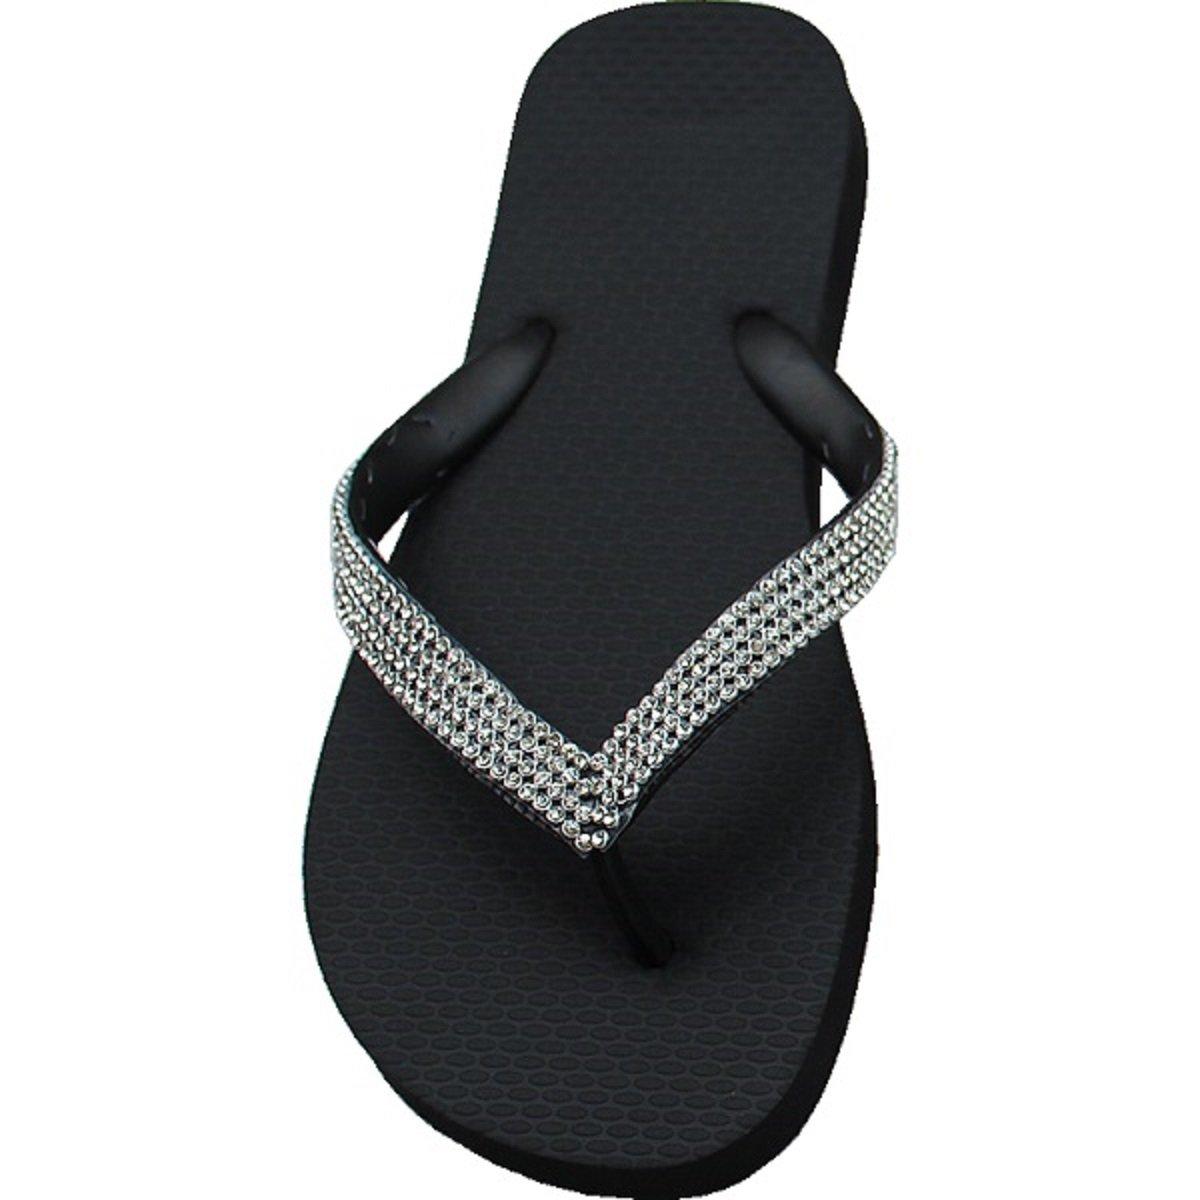 Designer Luxus Flip Flops-Chanclas Sandale Exclusivas Simone Herrera-Diamond Line-Aida-Riemchen Sandale Flops-Chanclas Zehentrenner e54224